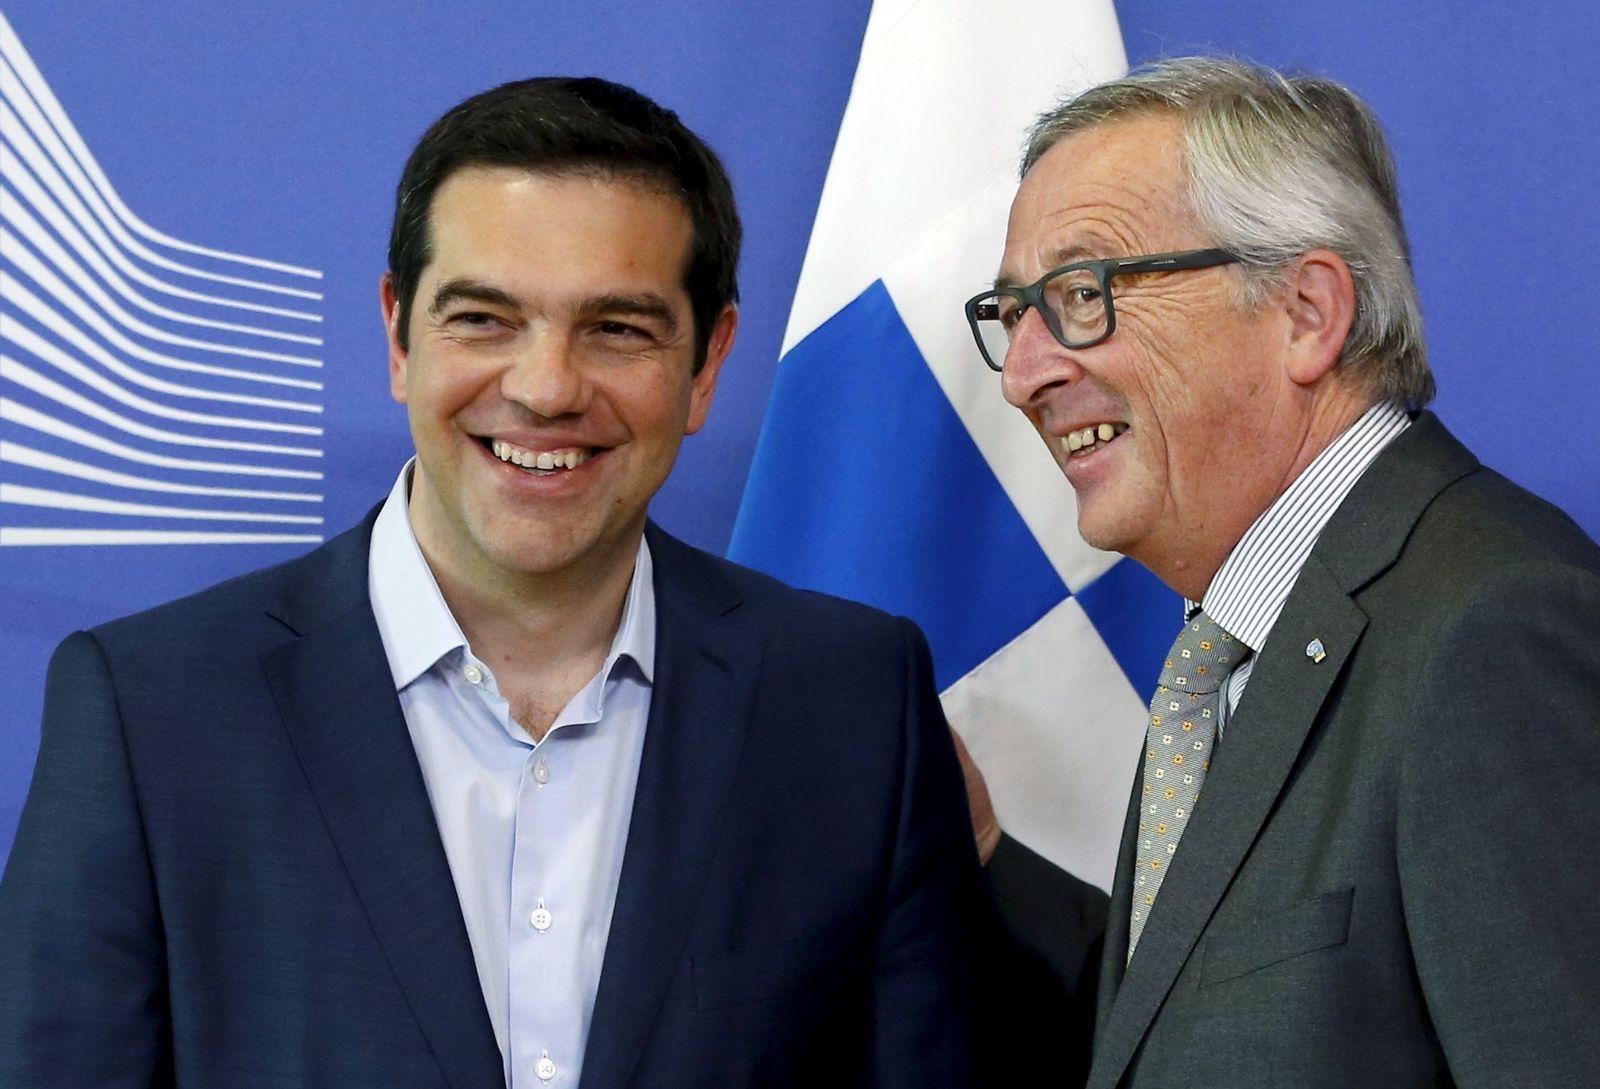 Alexis Tsipras/Jean-Claude Juncker